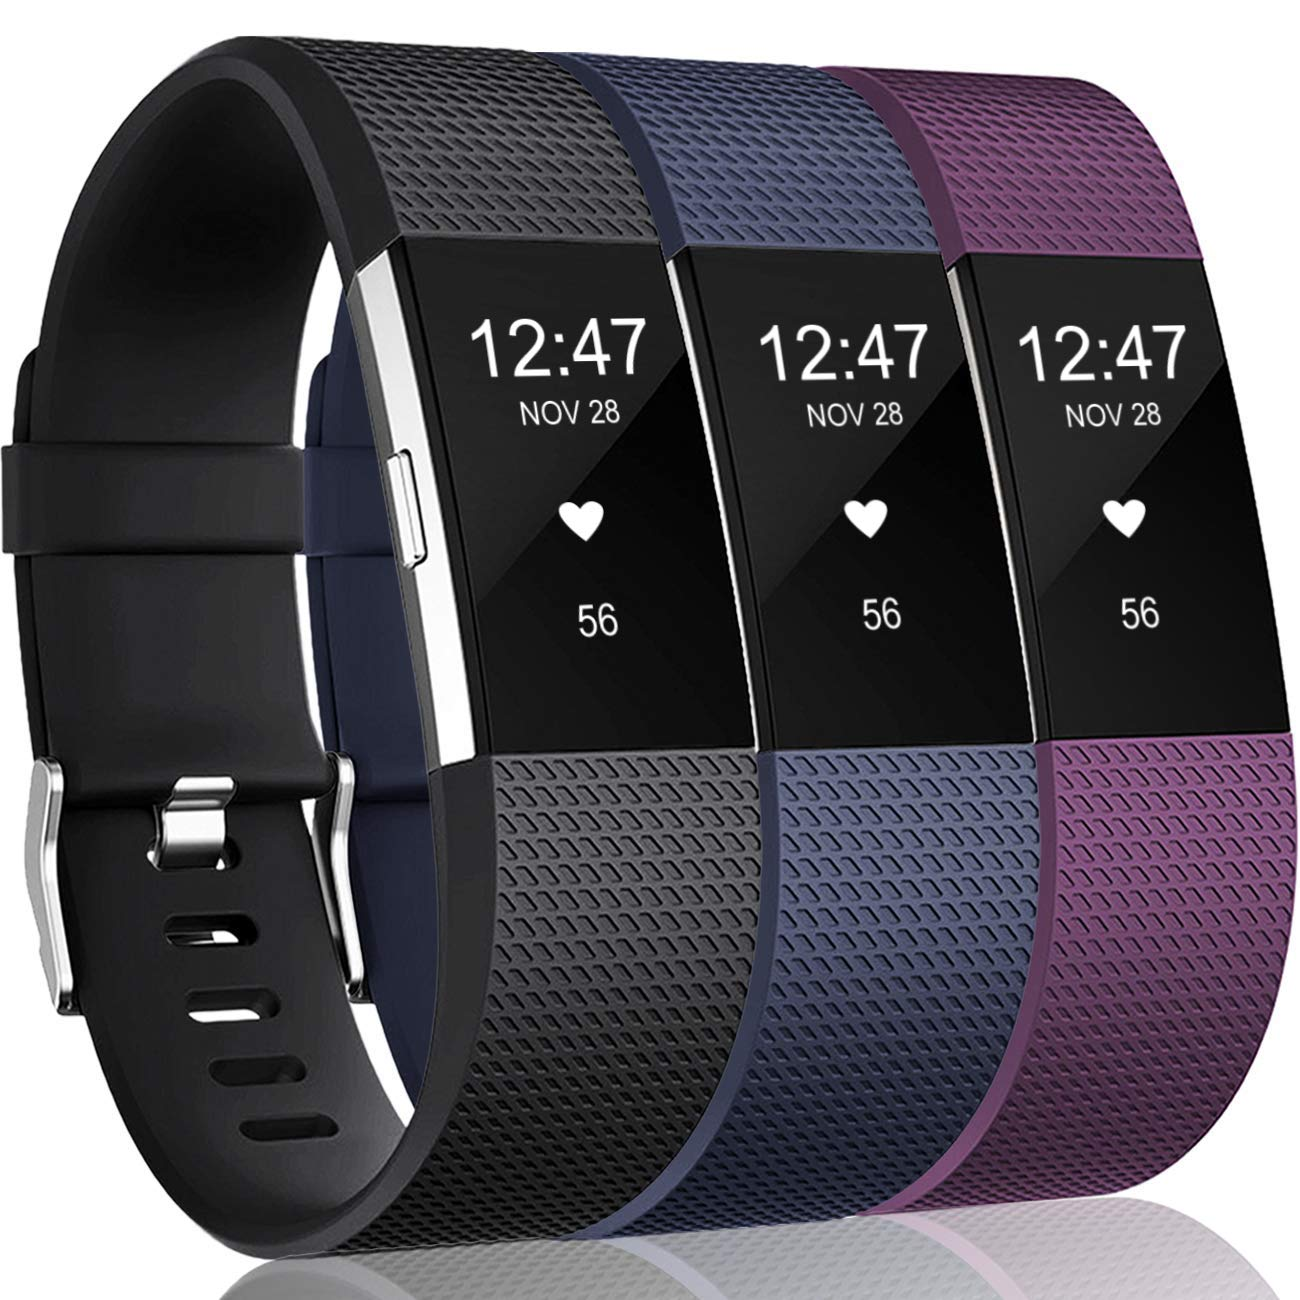 3 Mallas Small para Fitbit Charge 2 Azul marino / Negro / Ci